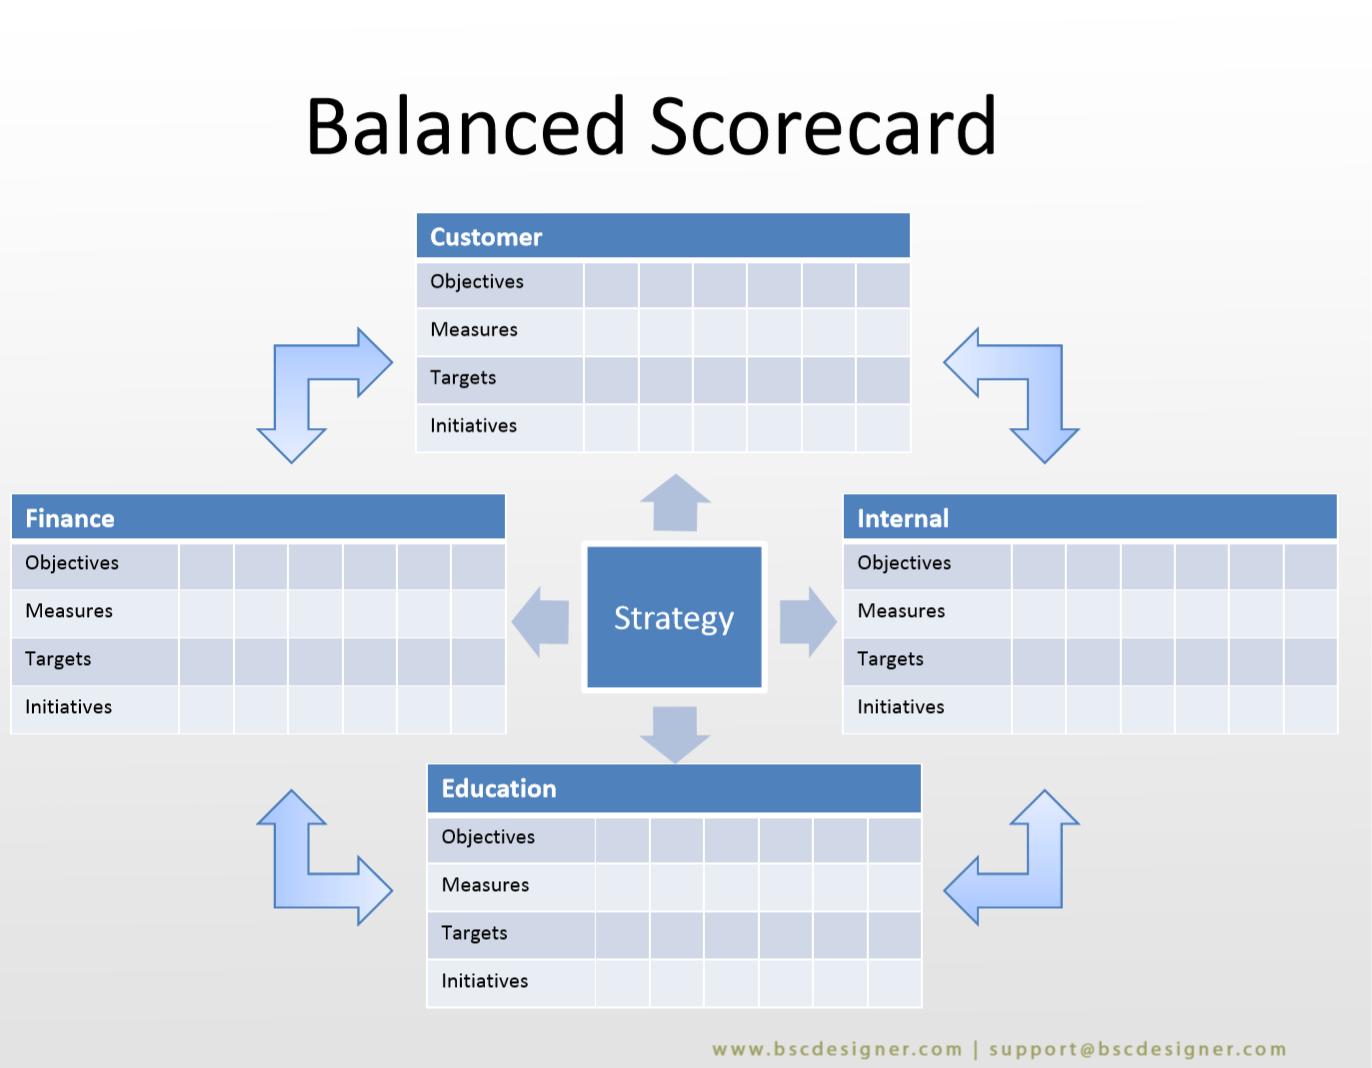 22 Balanced Scorecard Examples With Kpis